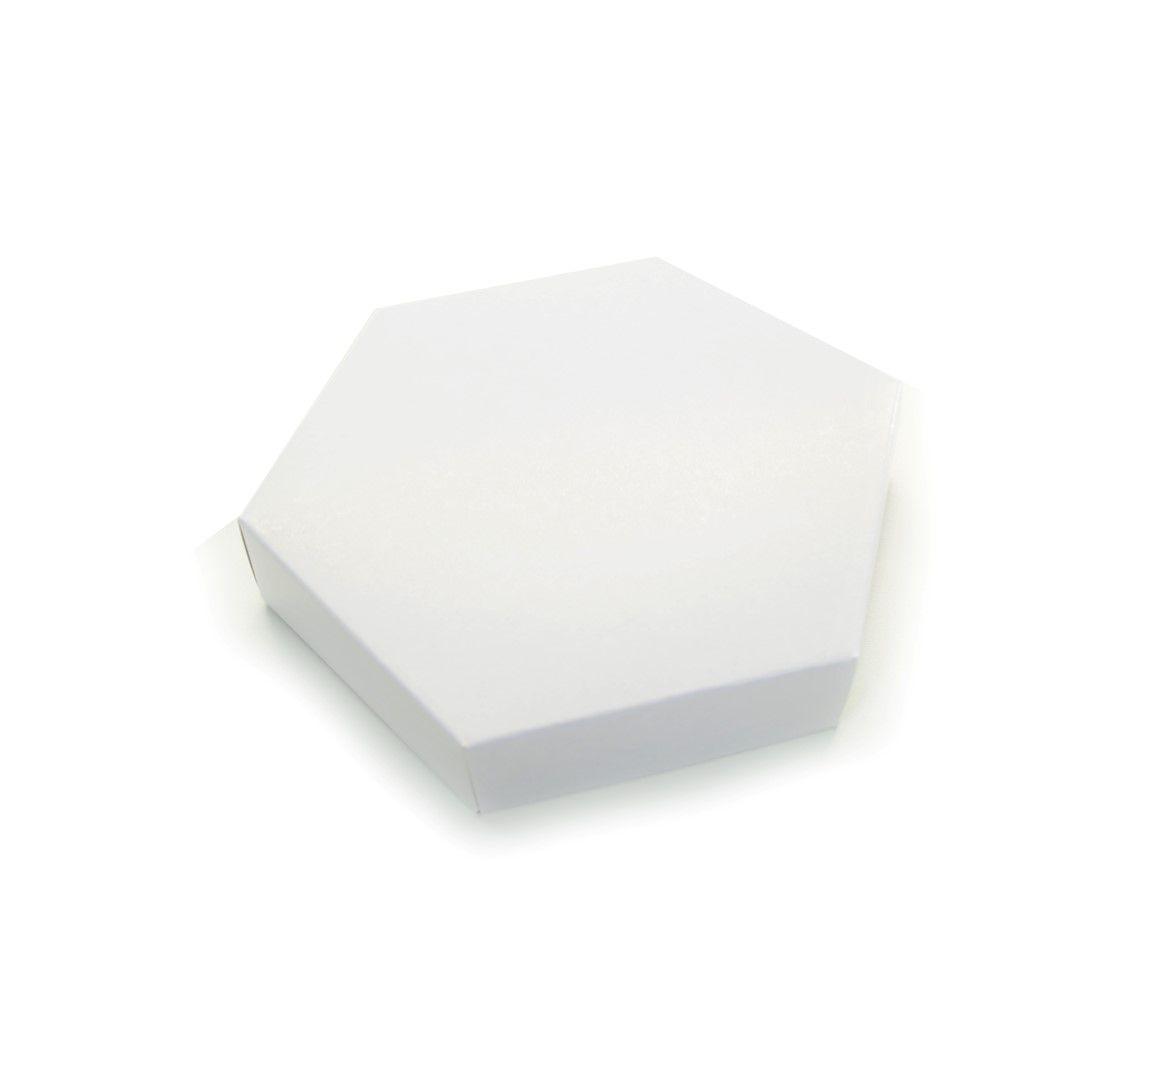 T009 - Tampa - 8,5x3,3 cm